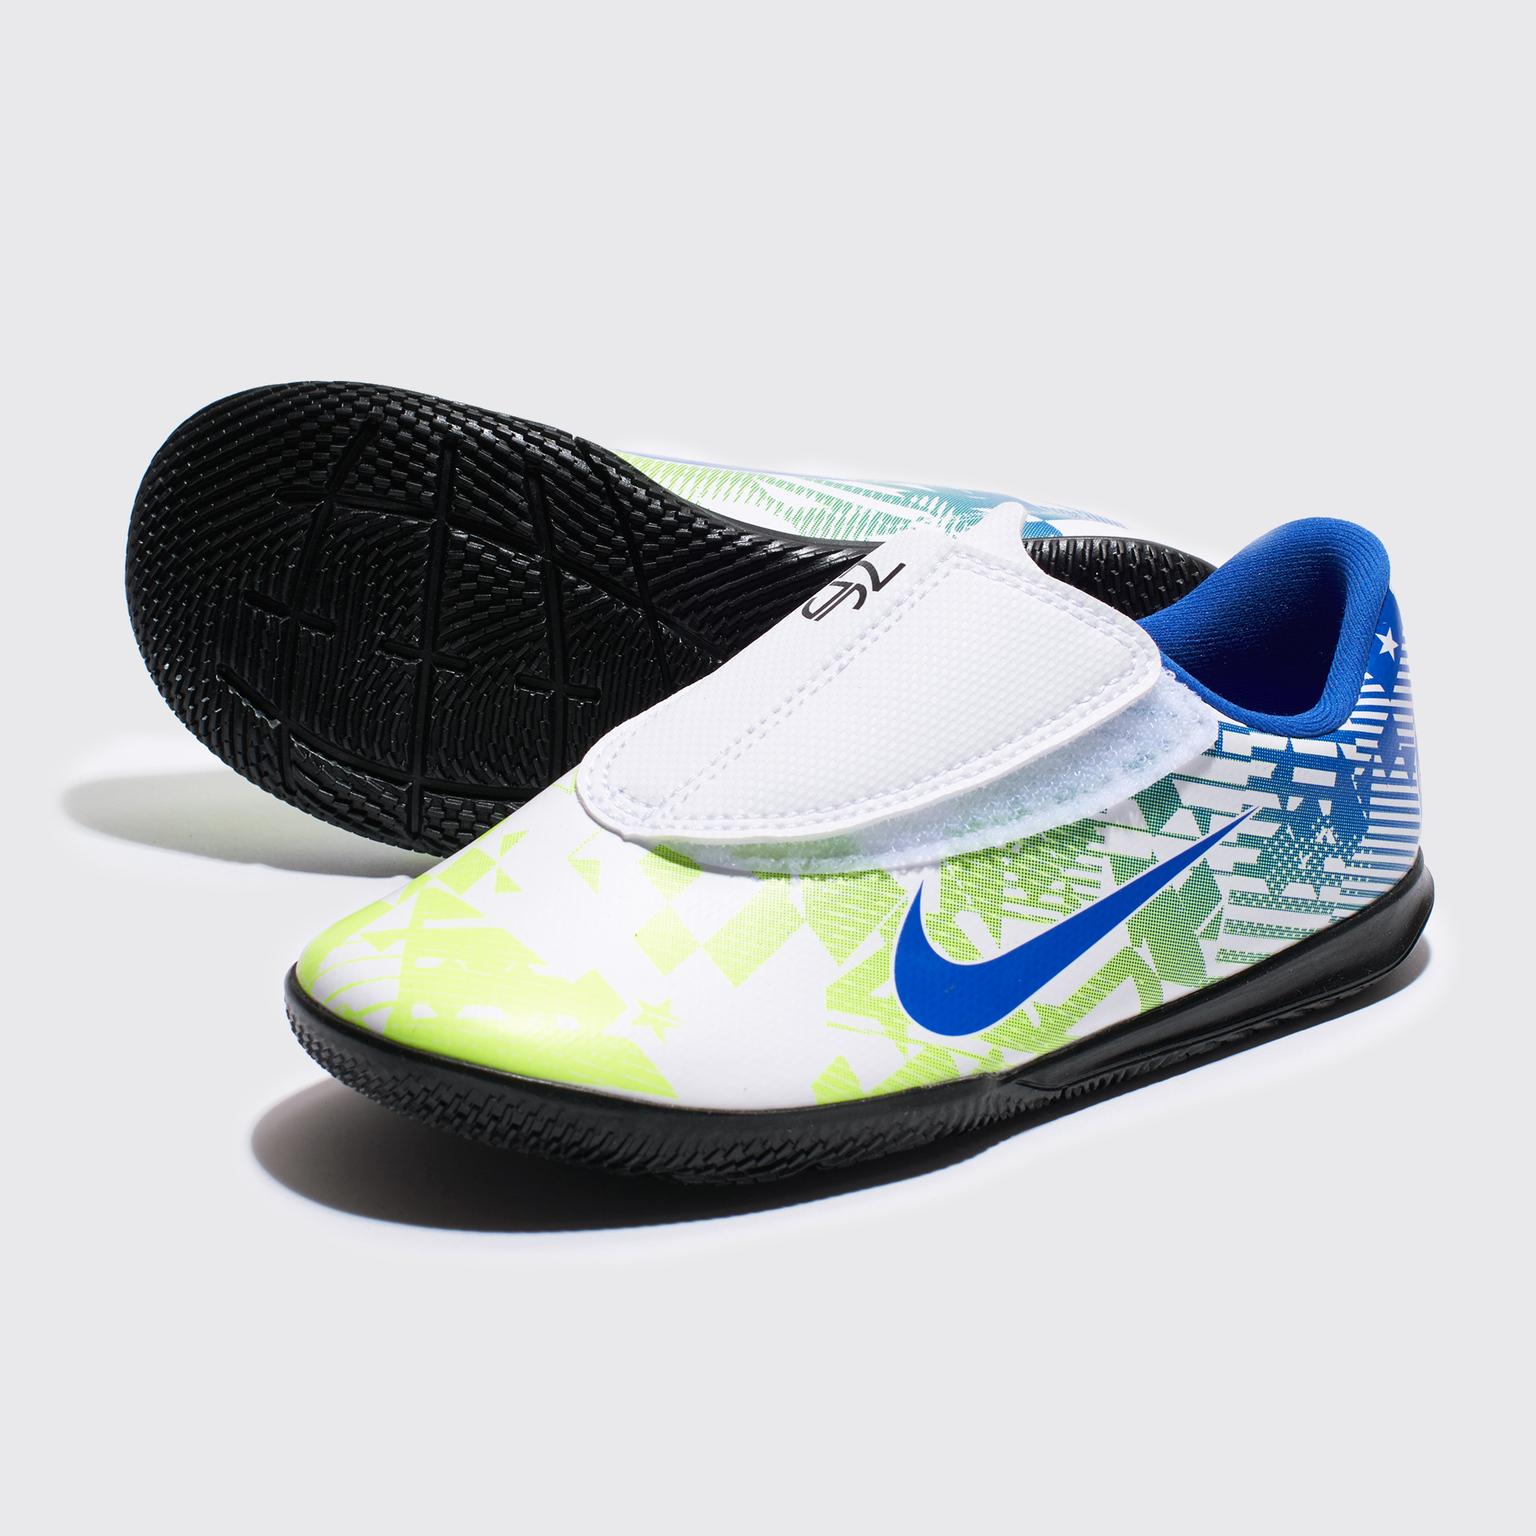 Фото - Футзалки детские Nike Vapor 13 Club Neymar IC PS AT8171-104 шиповки детские nike vapor 13 academy neymar tf at8144 104